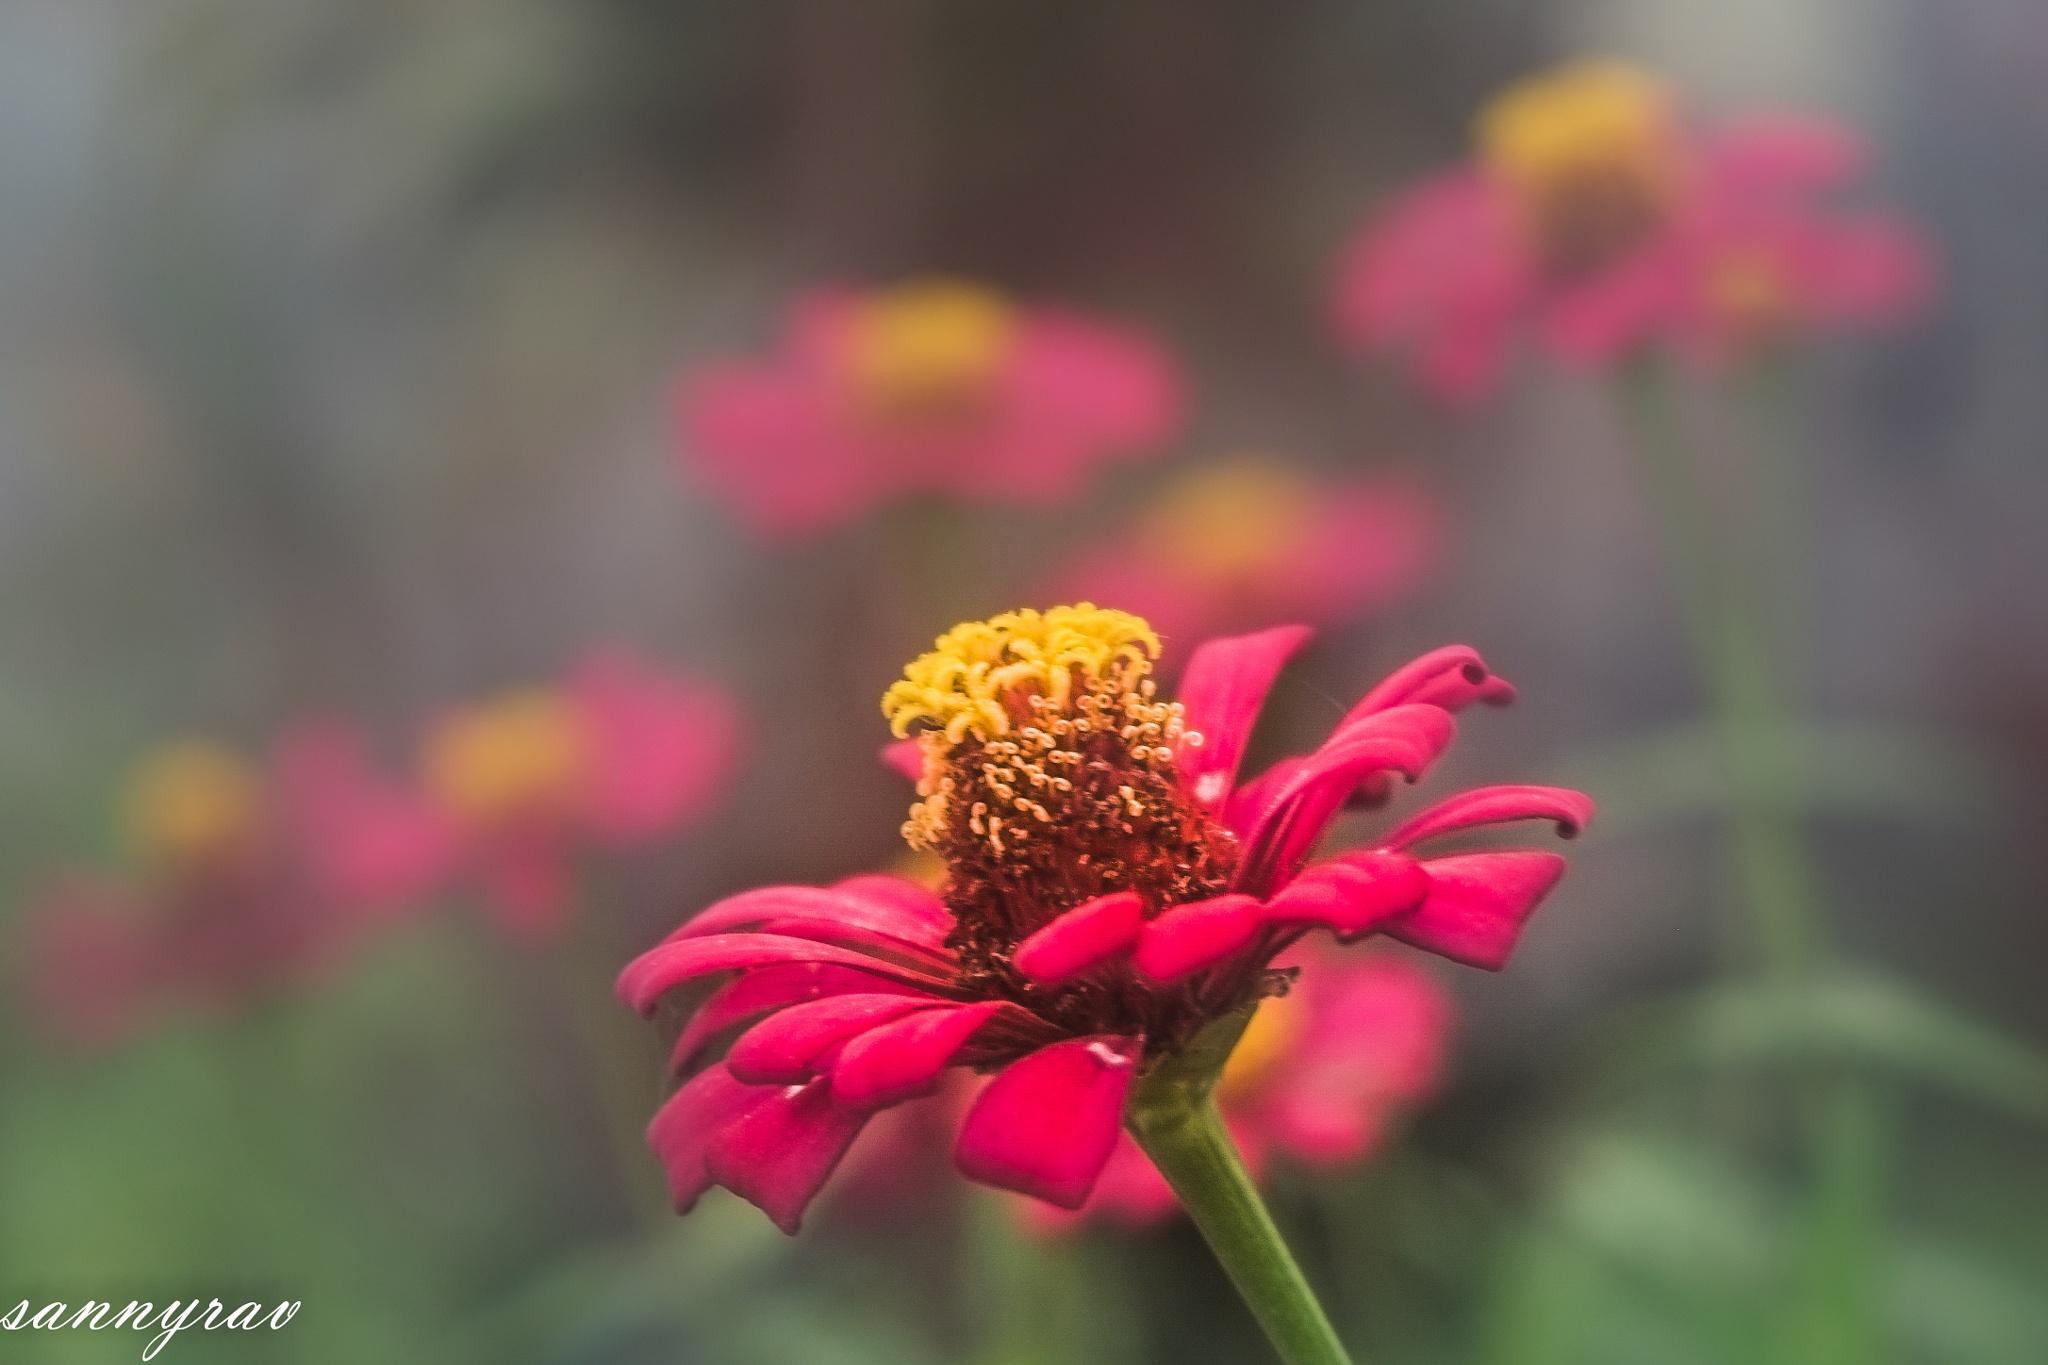 red flower by sannyrav